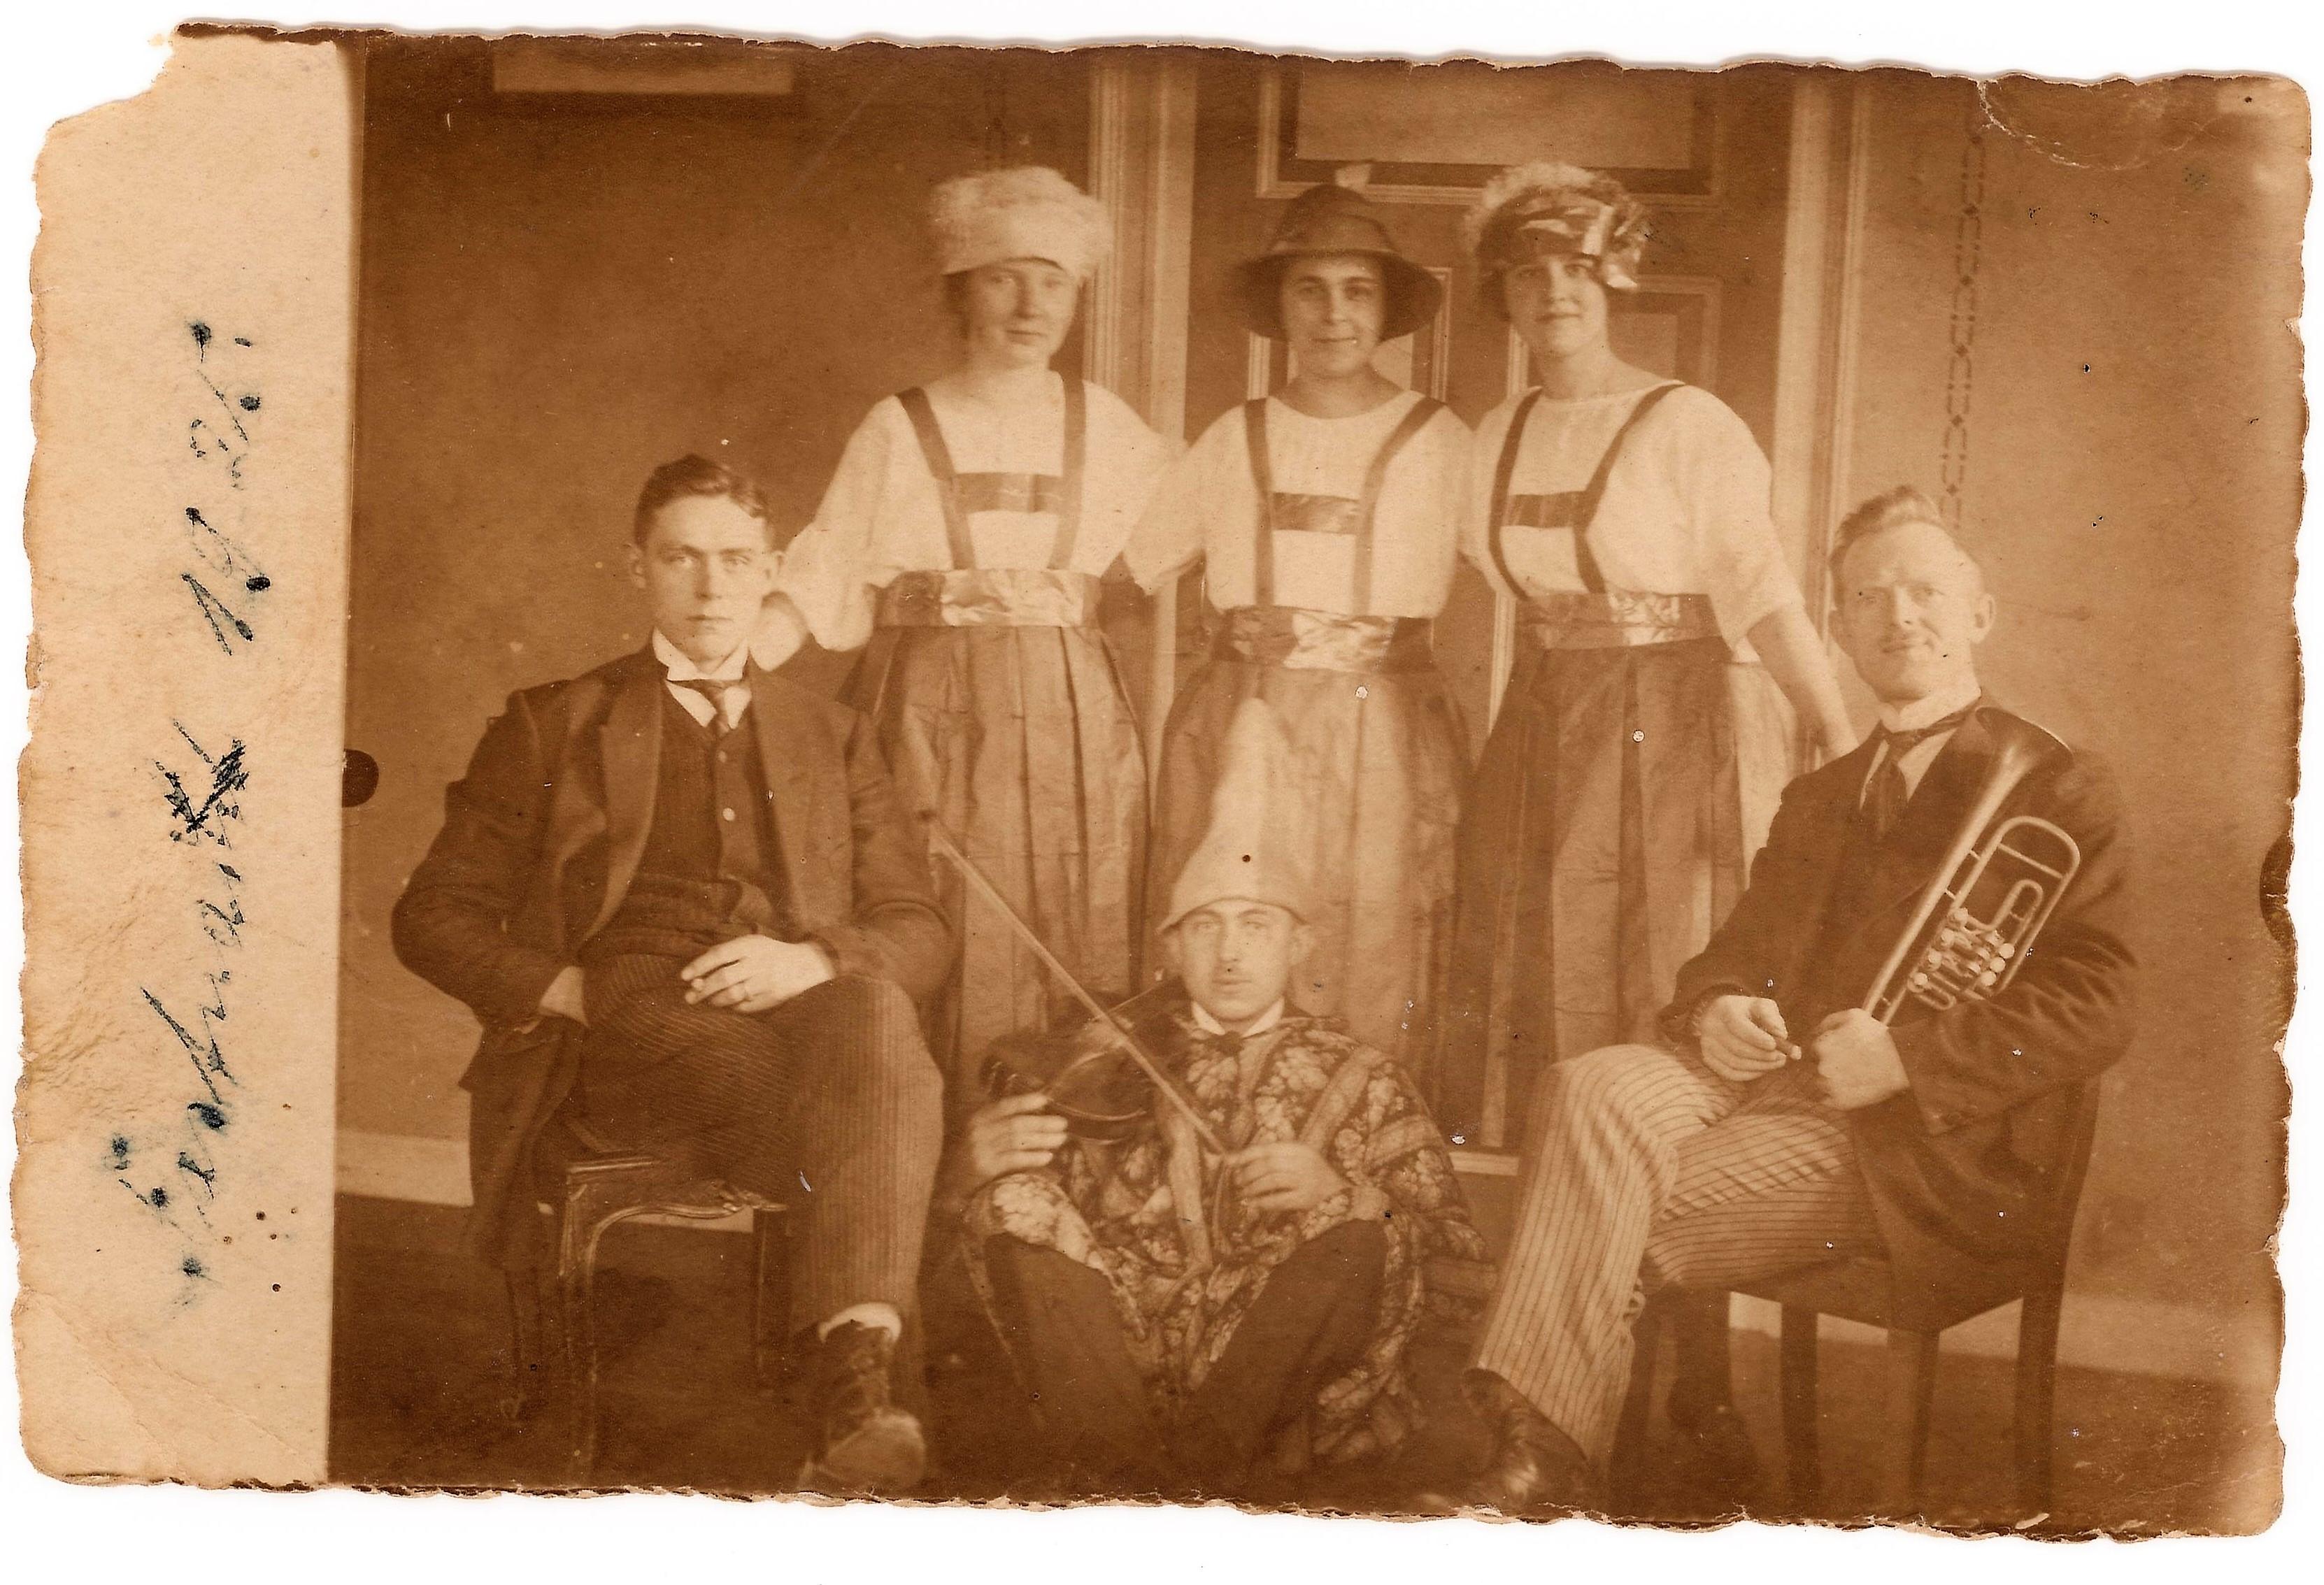 1925 Karneval drinnen